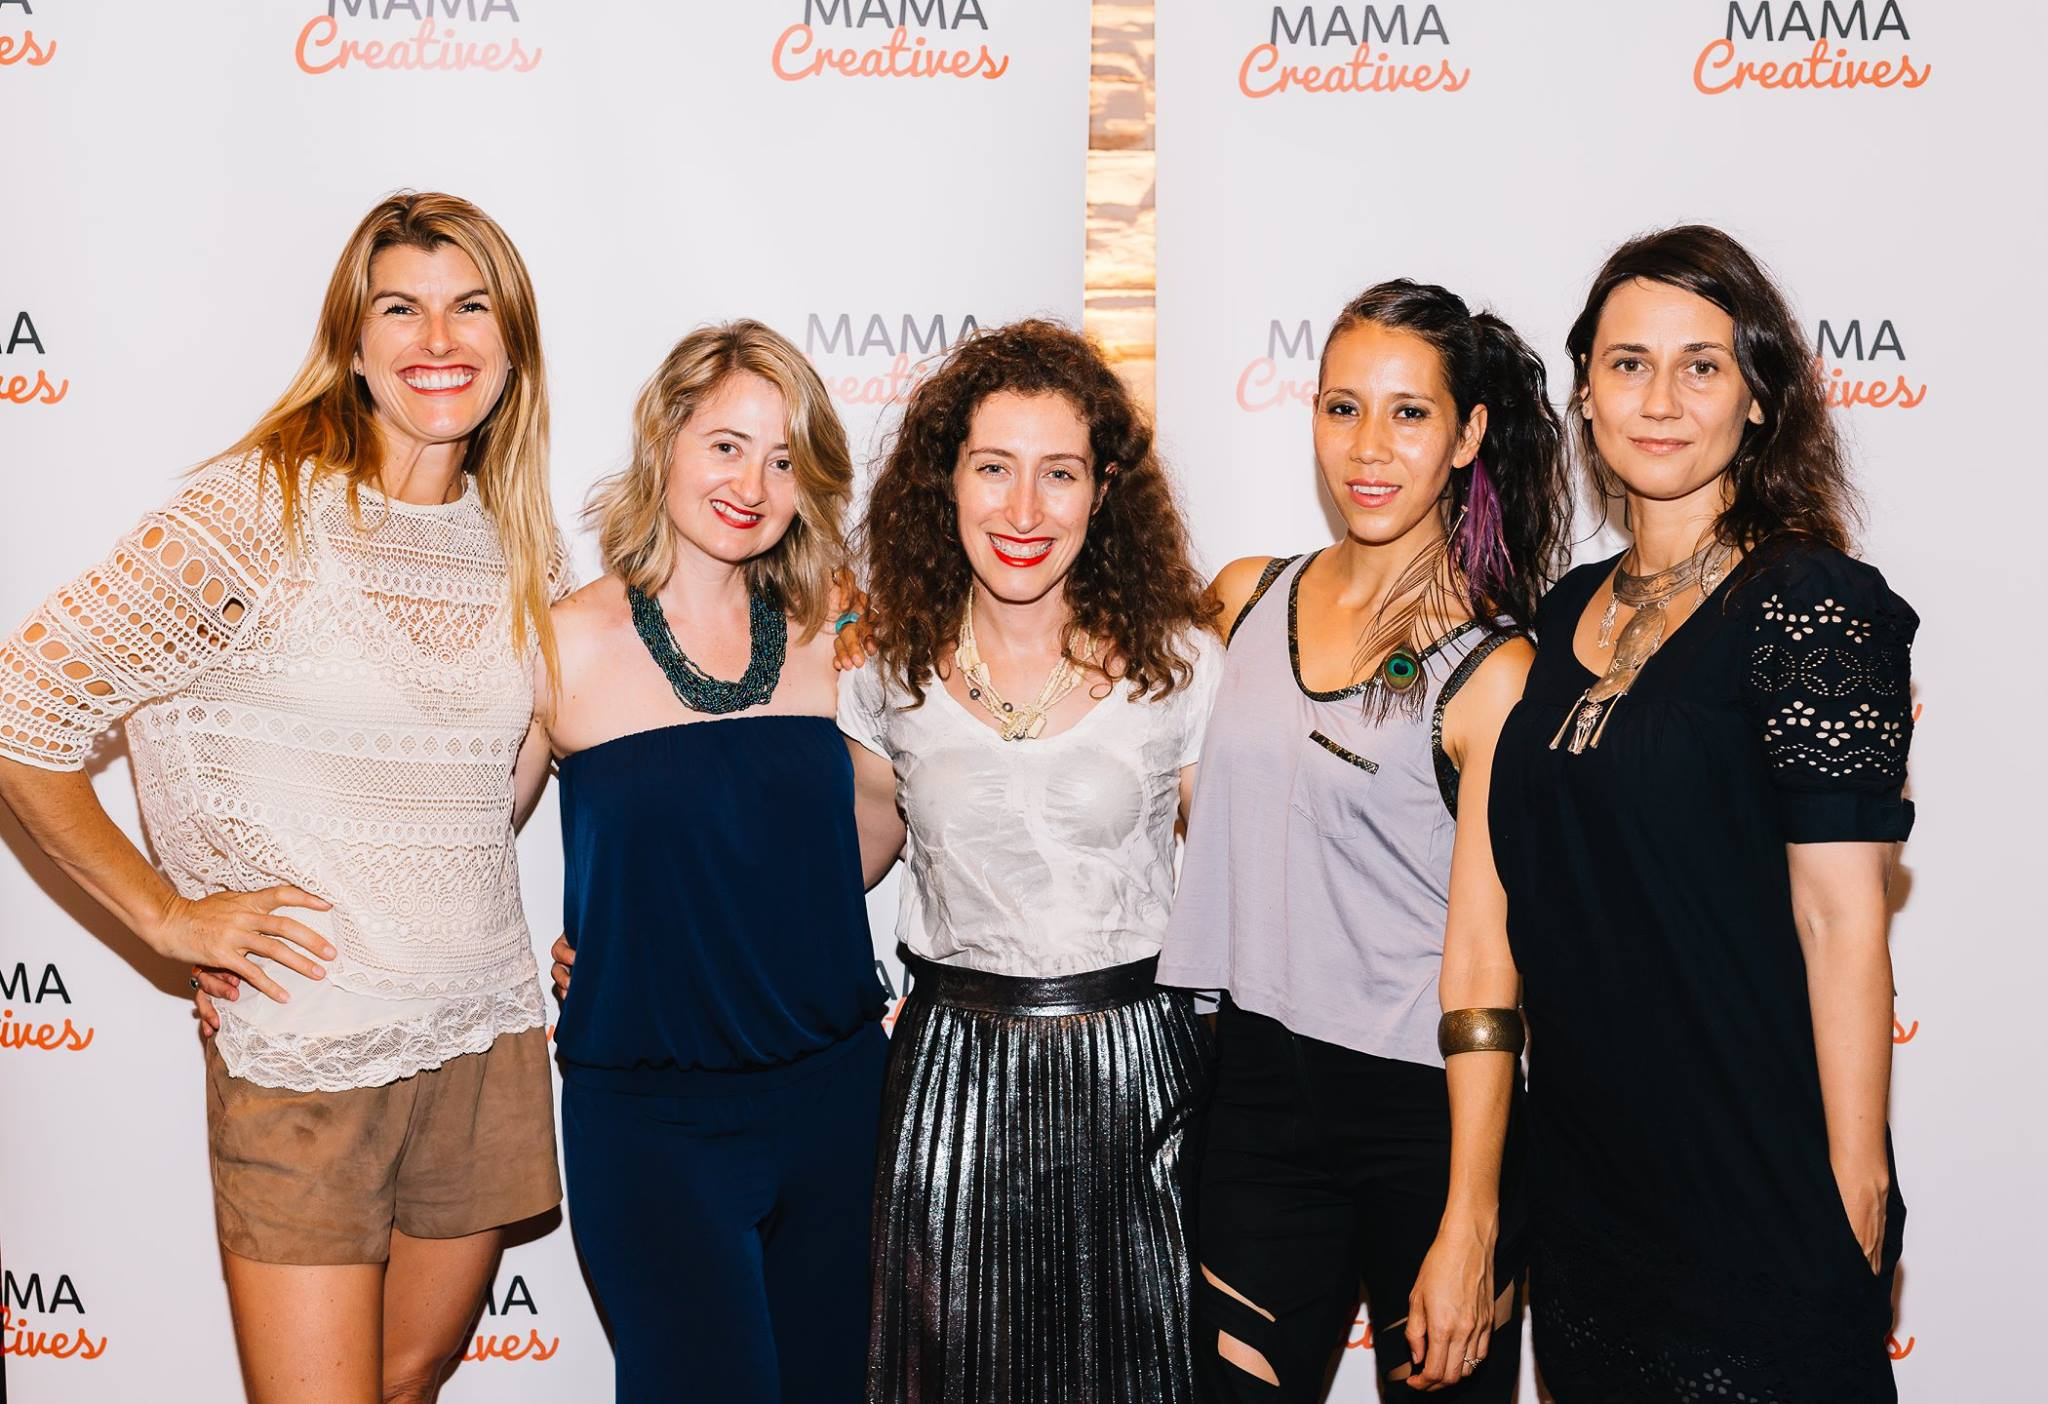 The gorgeous and super talented creative mamas, Lizzy Williamson, Anna Kellerman, Naomi Tarszisz, Suni Sanchez and Dominika Ferenz.